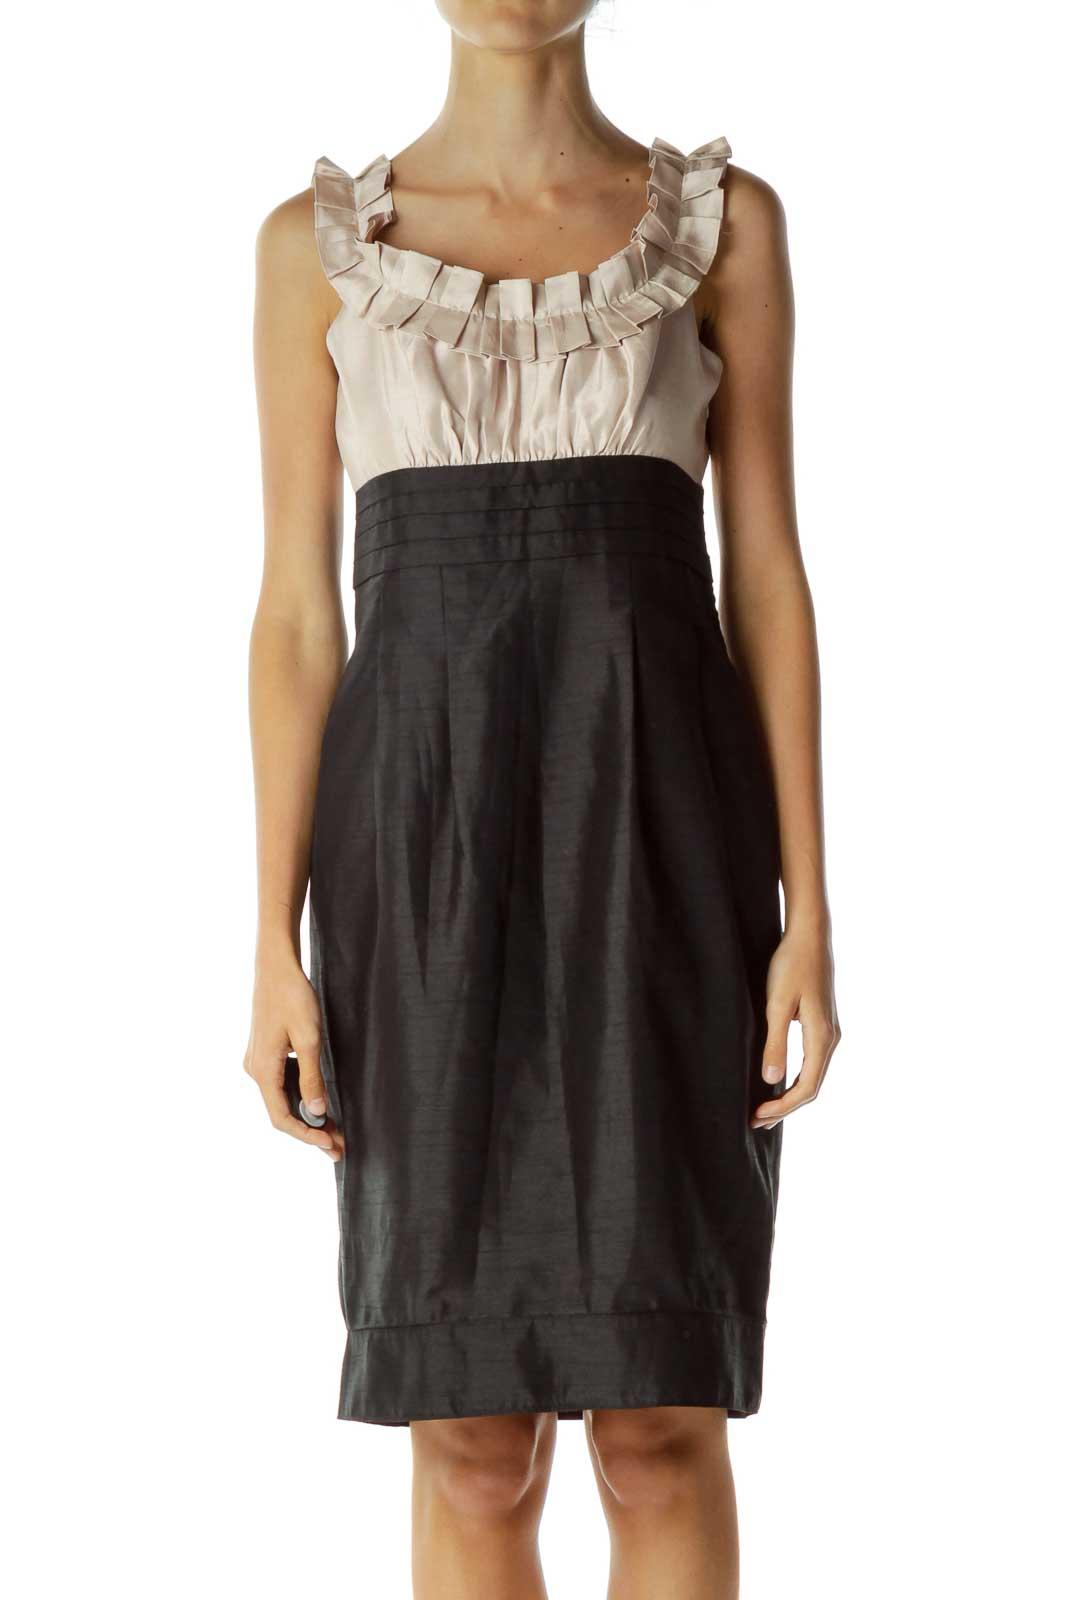 Black Beige Ruffle Detail Cocktail Dress Front